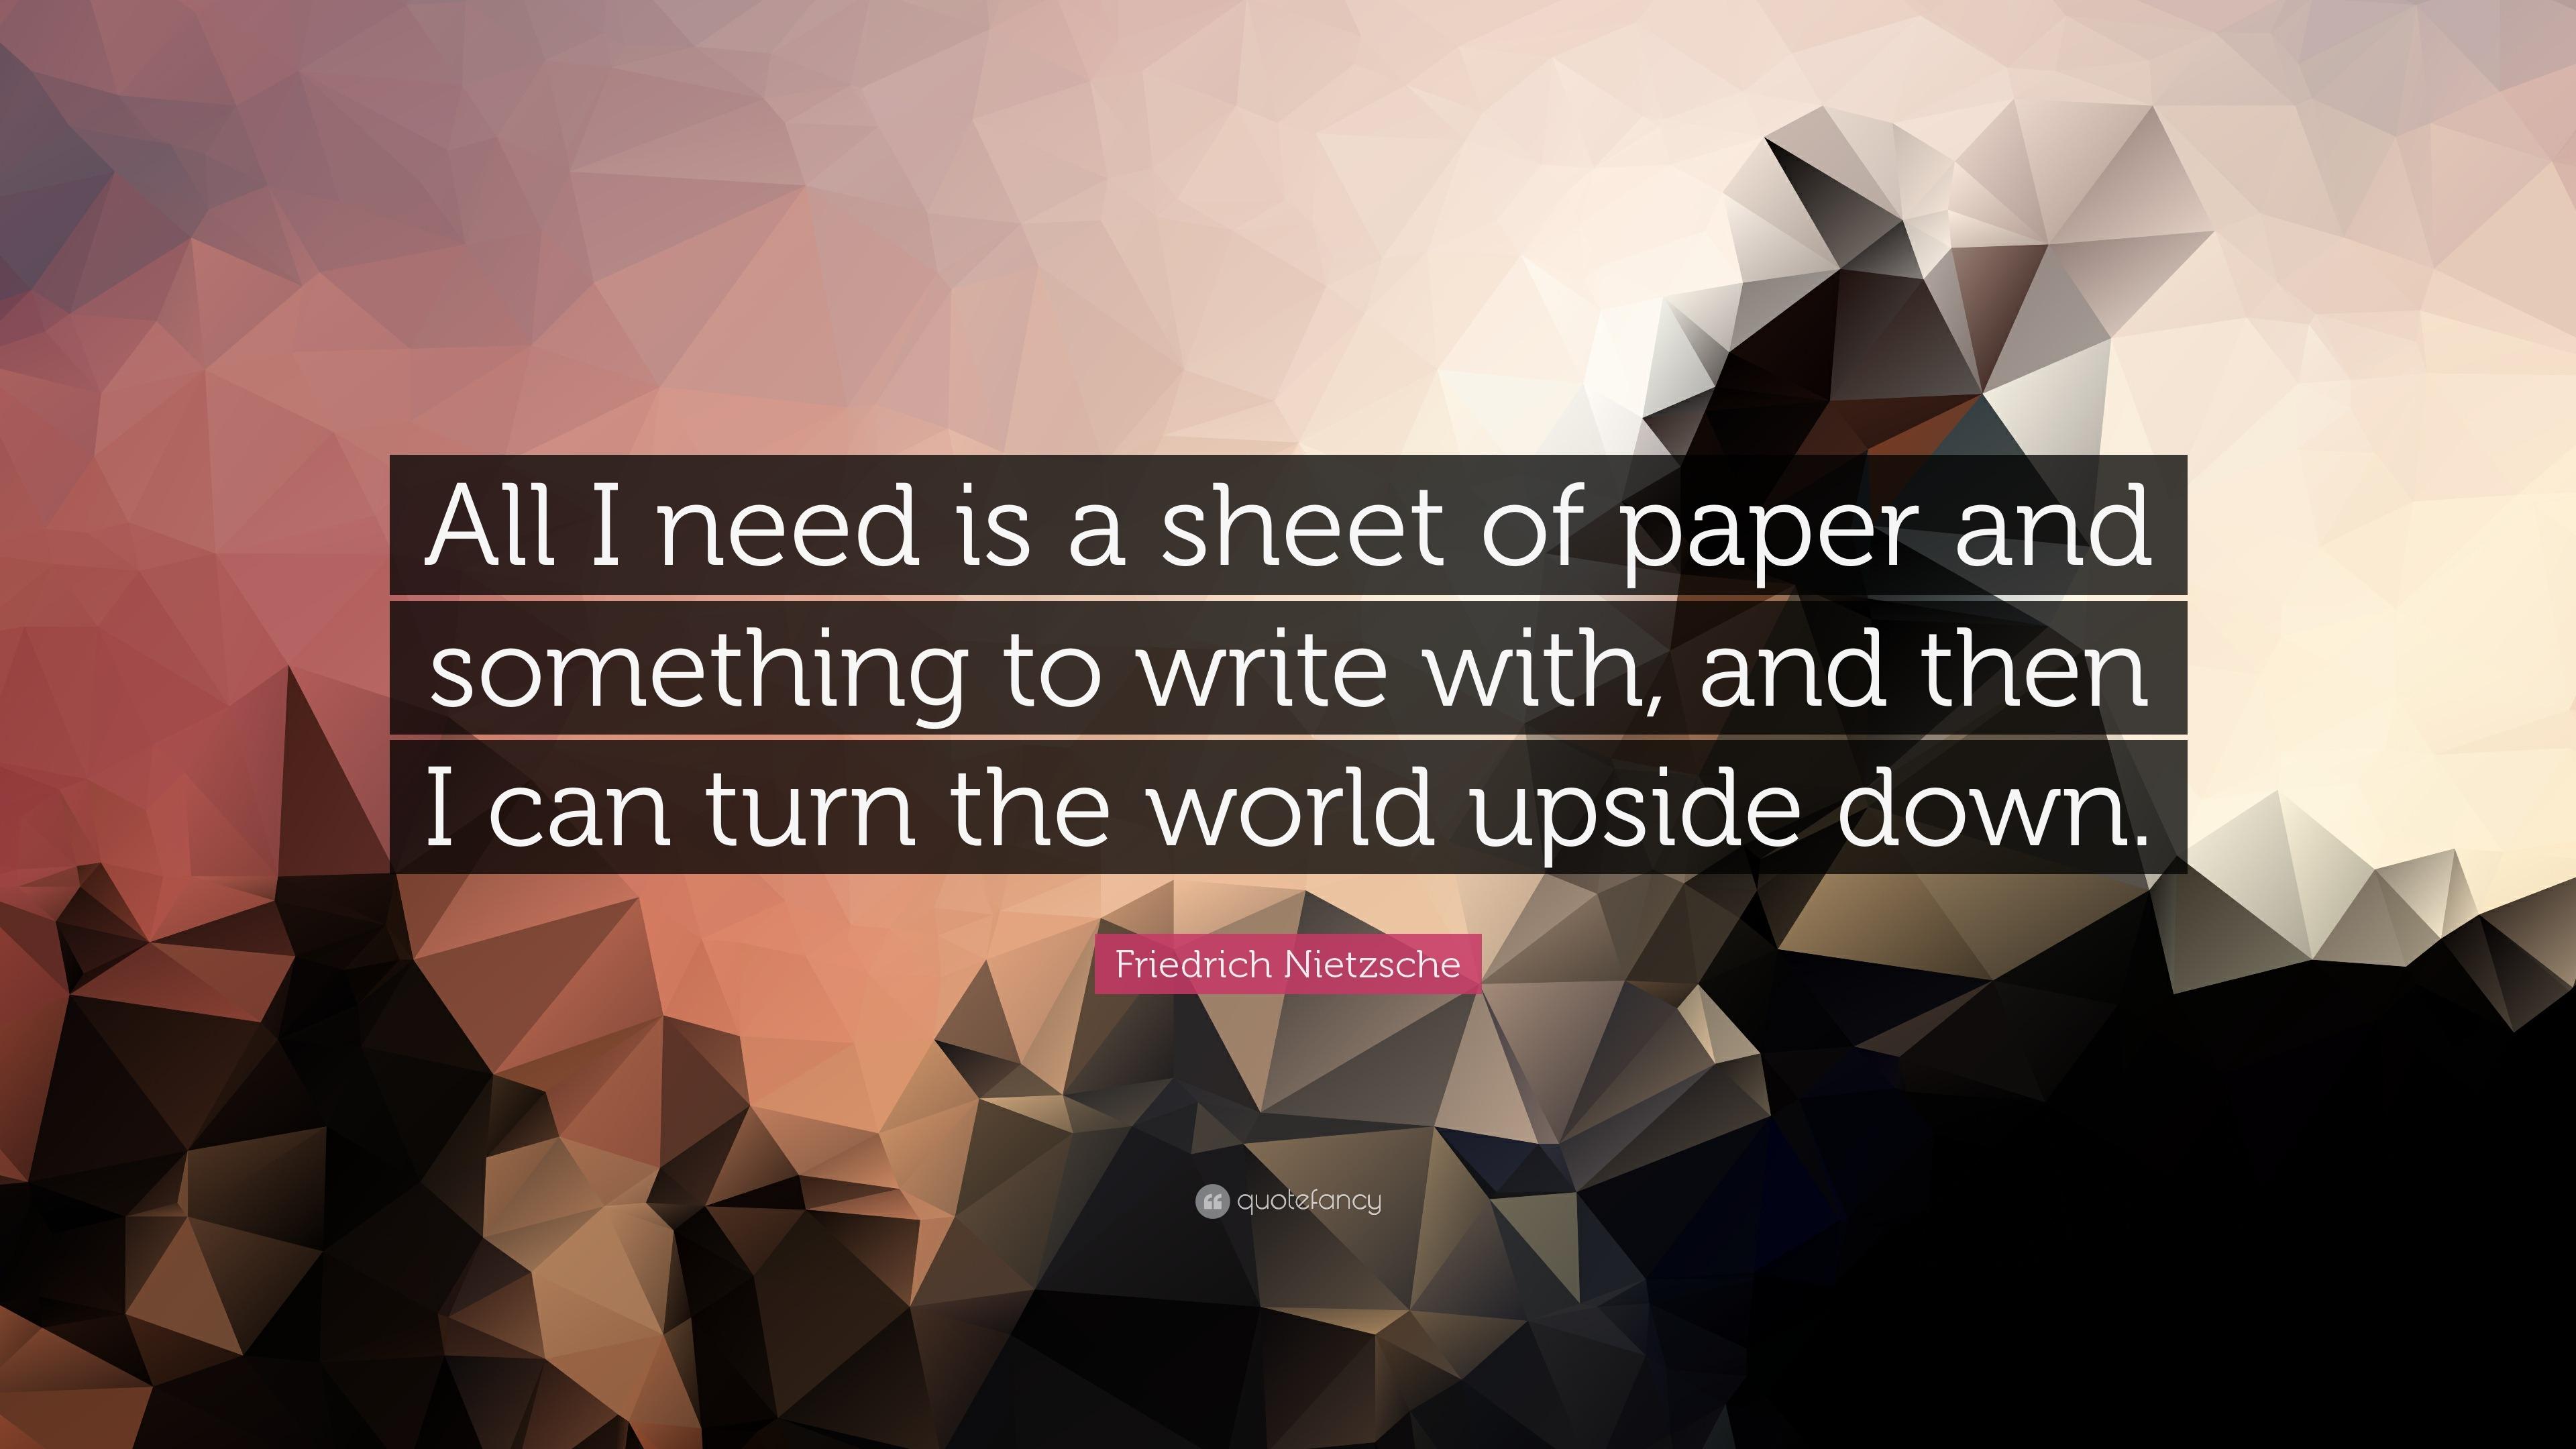 I need paper